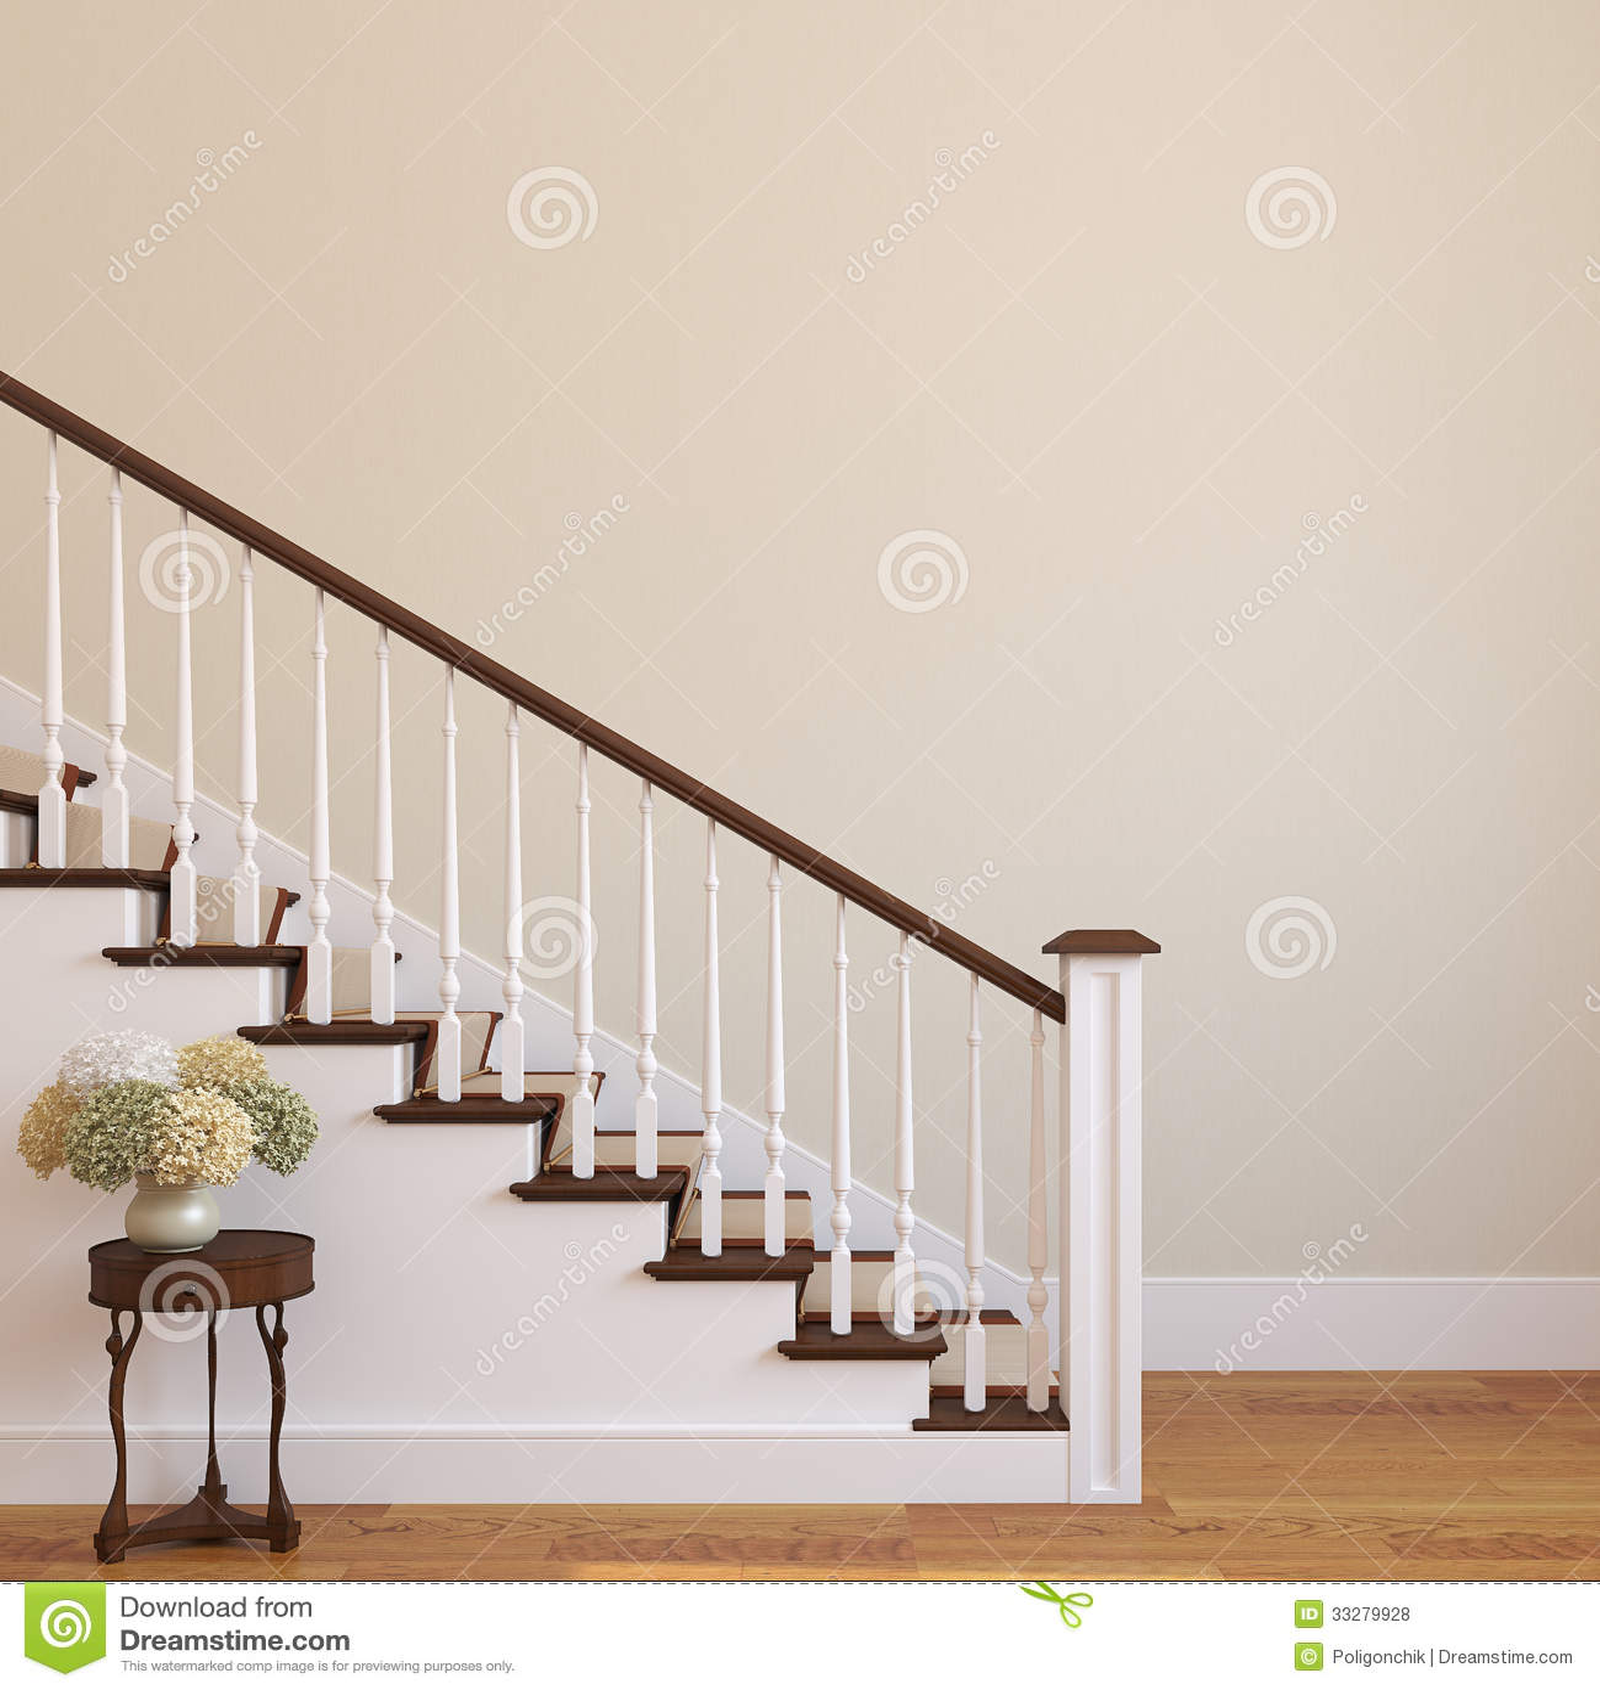 escalera en la casa moderna